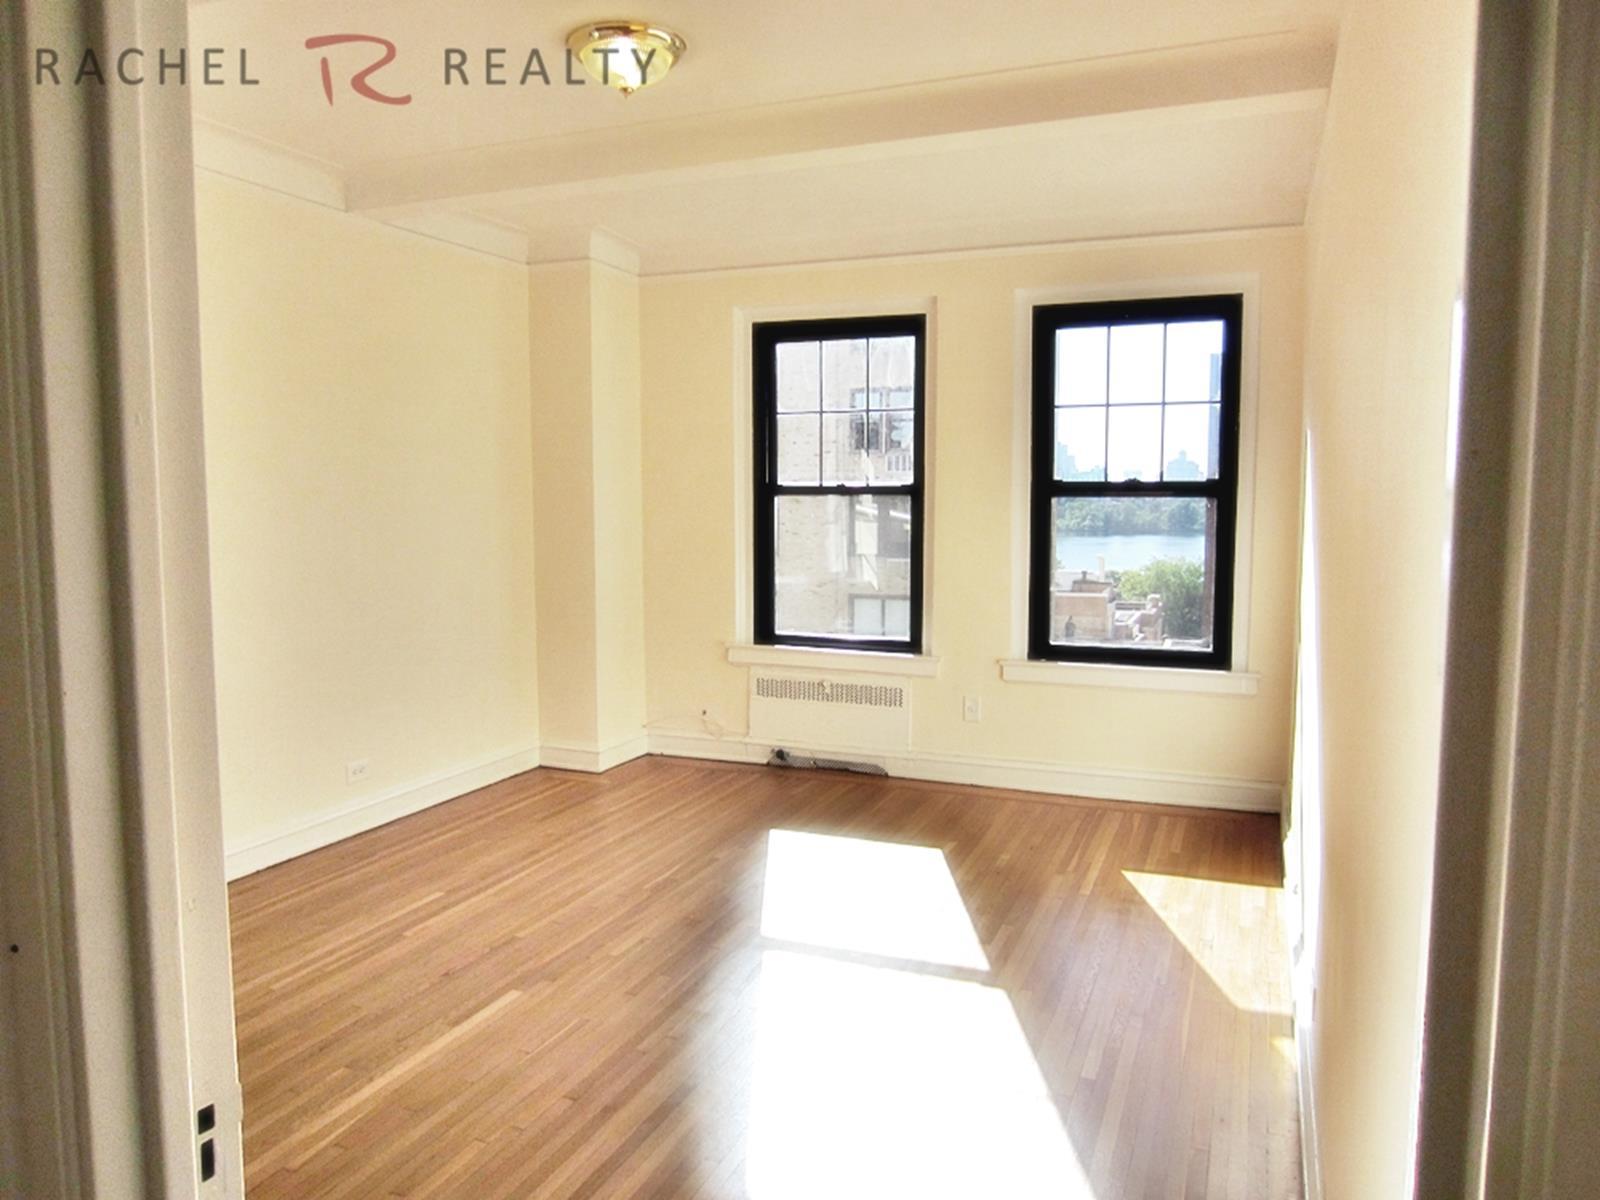 46 East 91st Street Carnegie Hill New York NY 10128